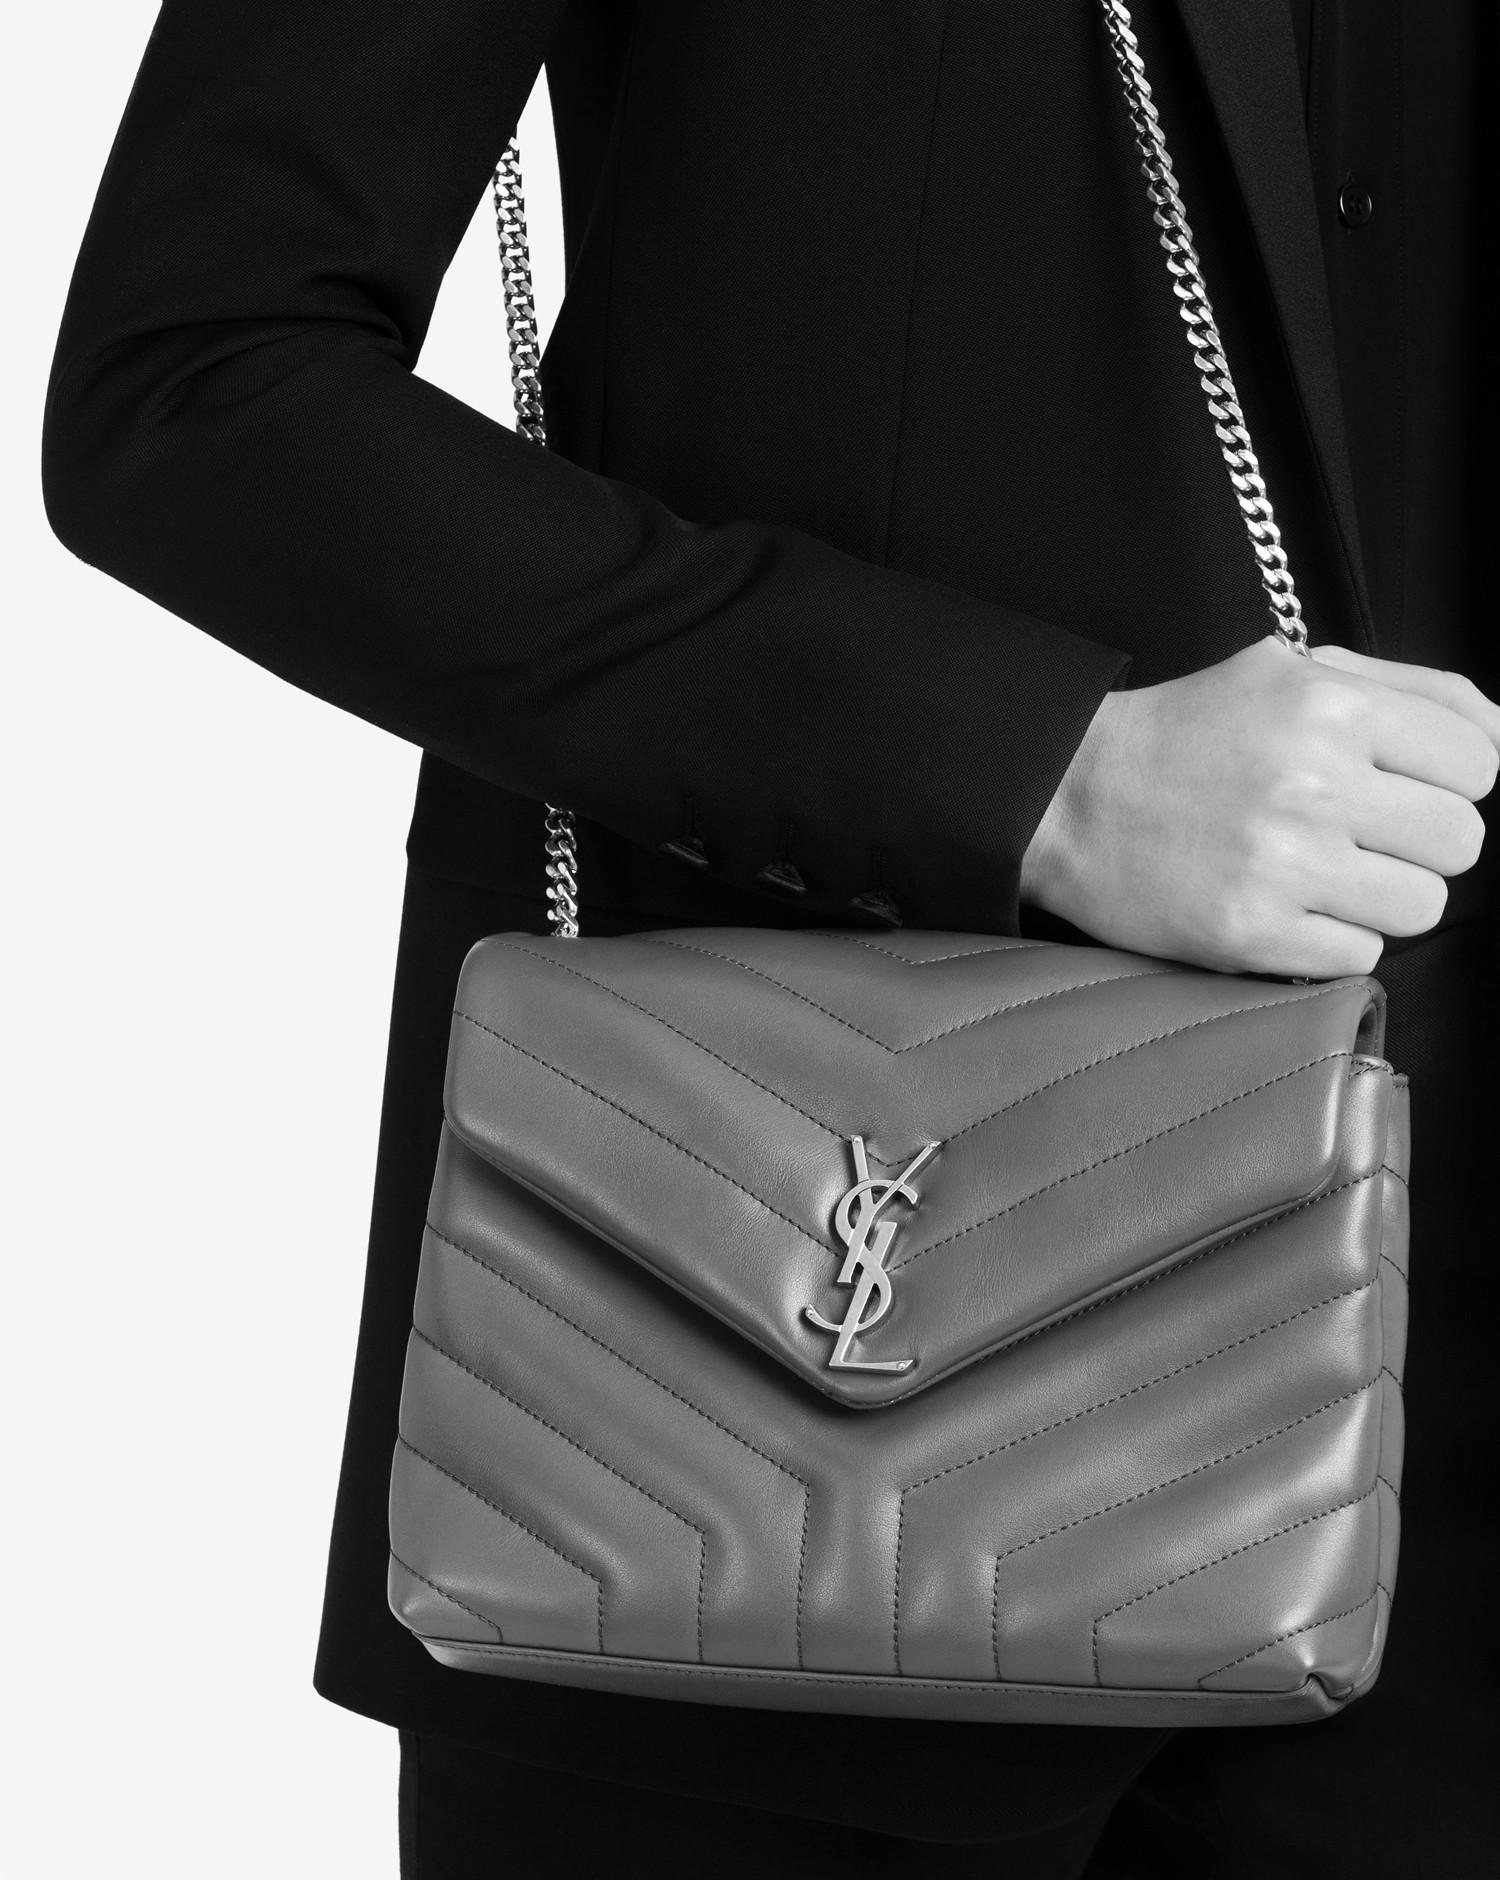 041fd8b10827 Saint Laurent Small Loulou Chain Bag In Grey